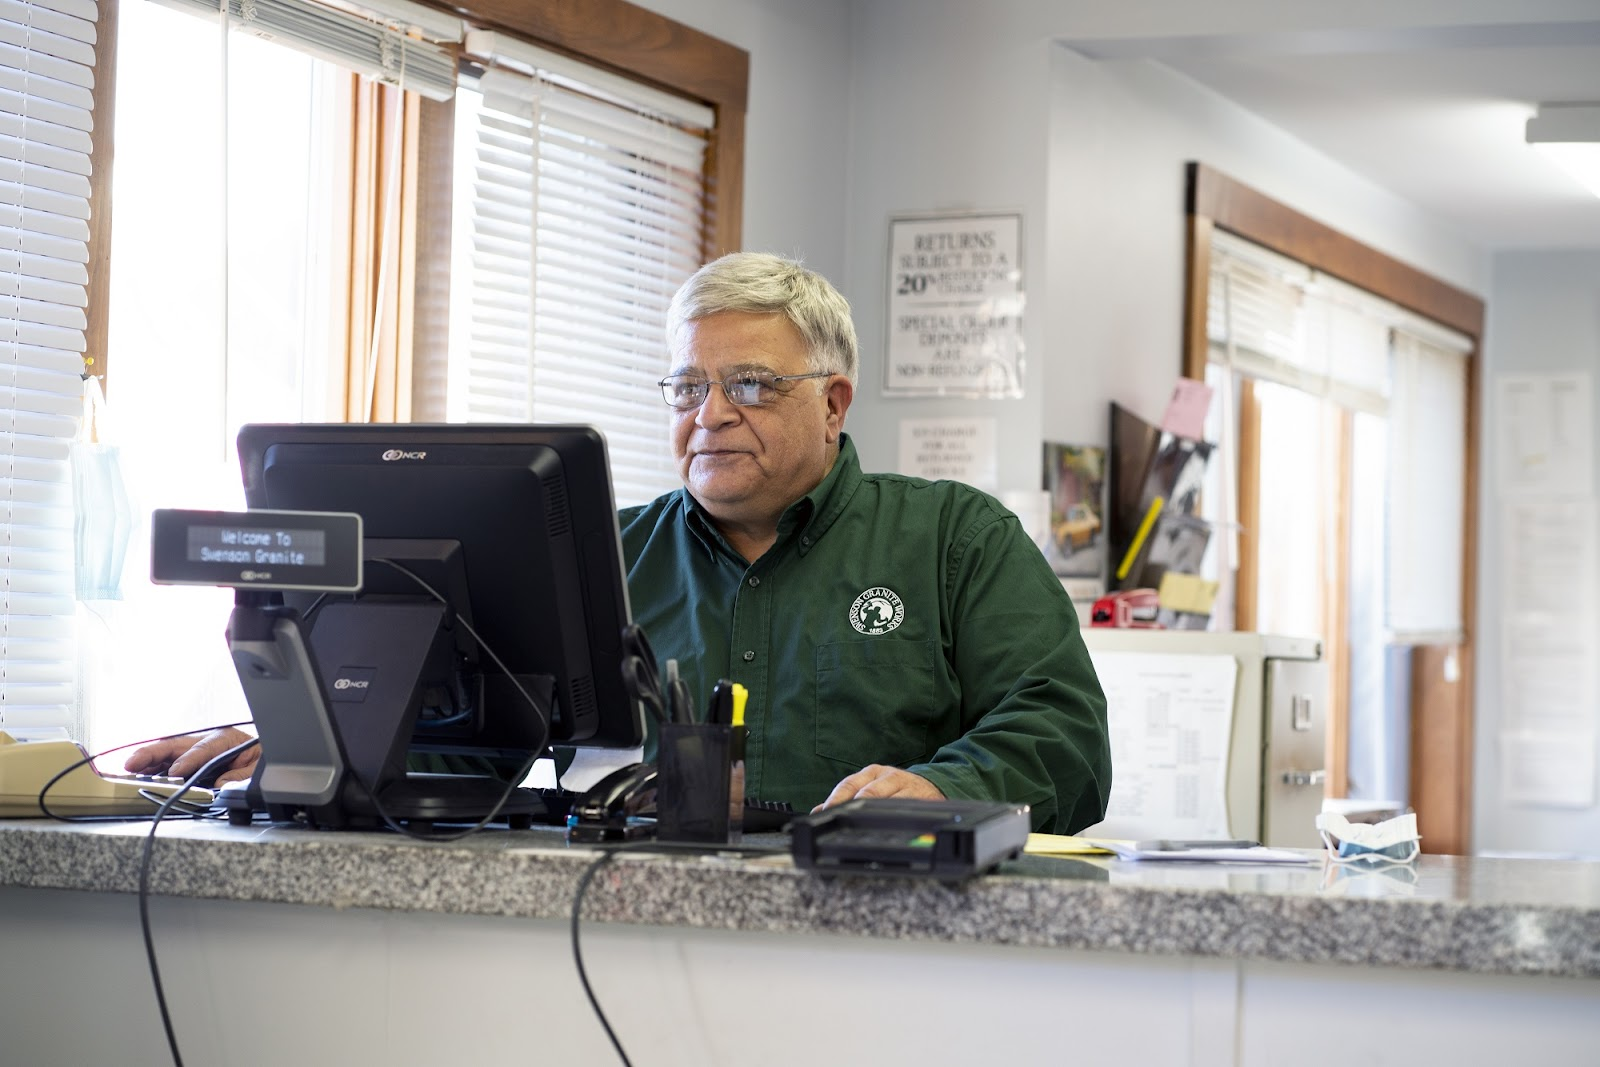 Bill Haddad, Swenson Granite Works Medway Store Manager